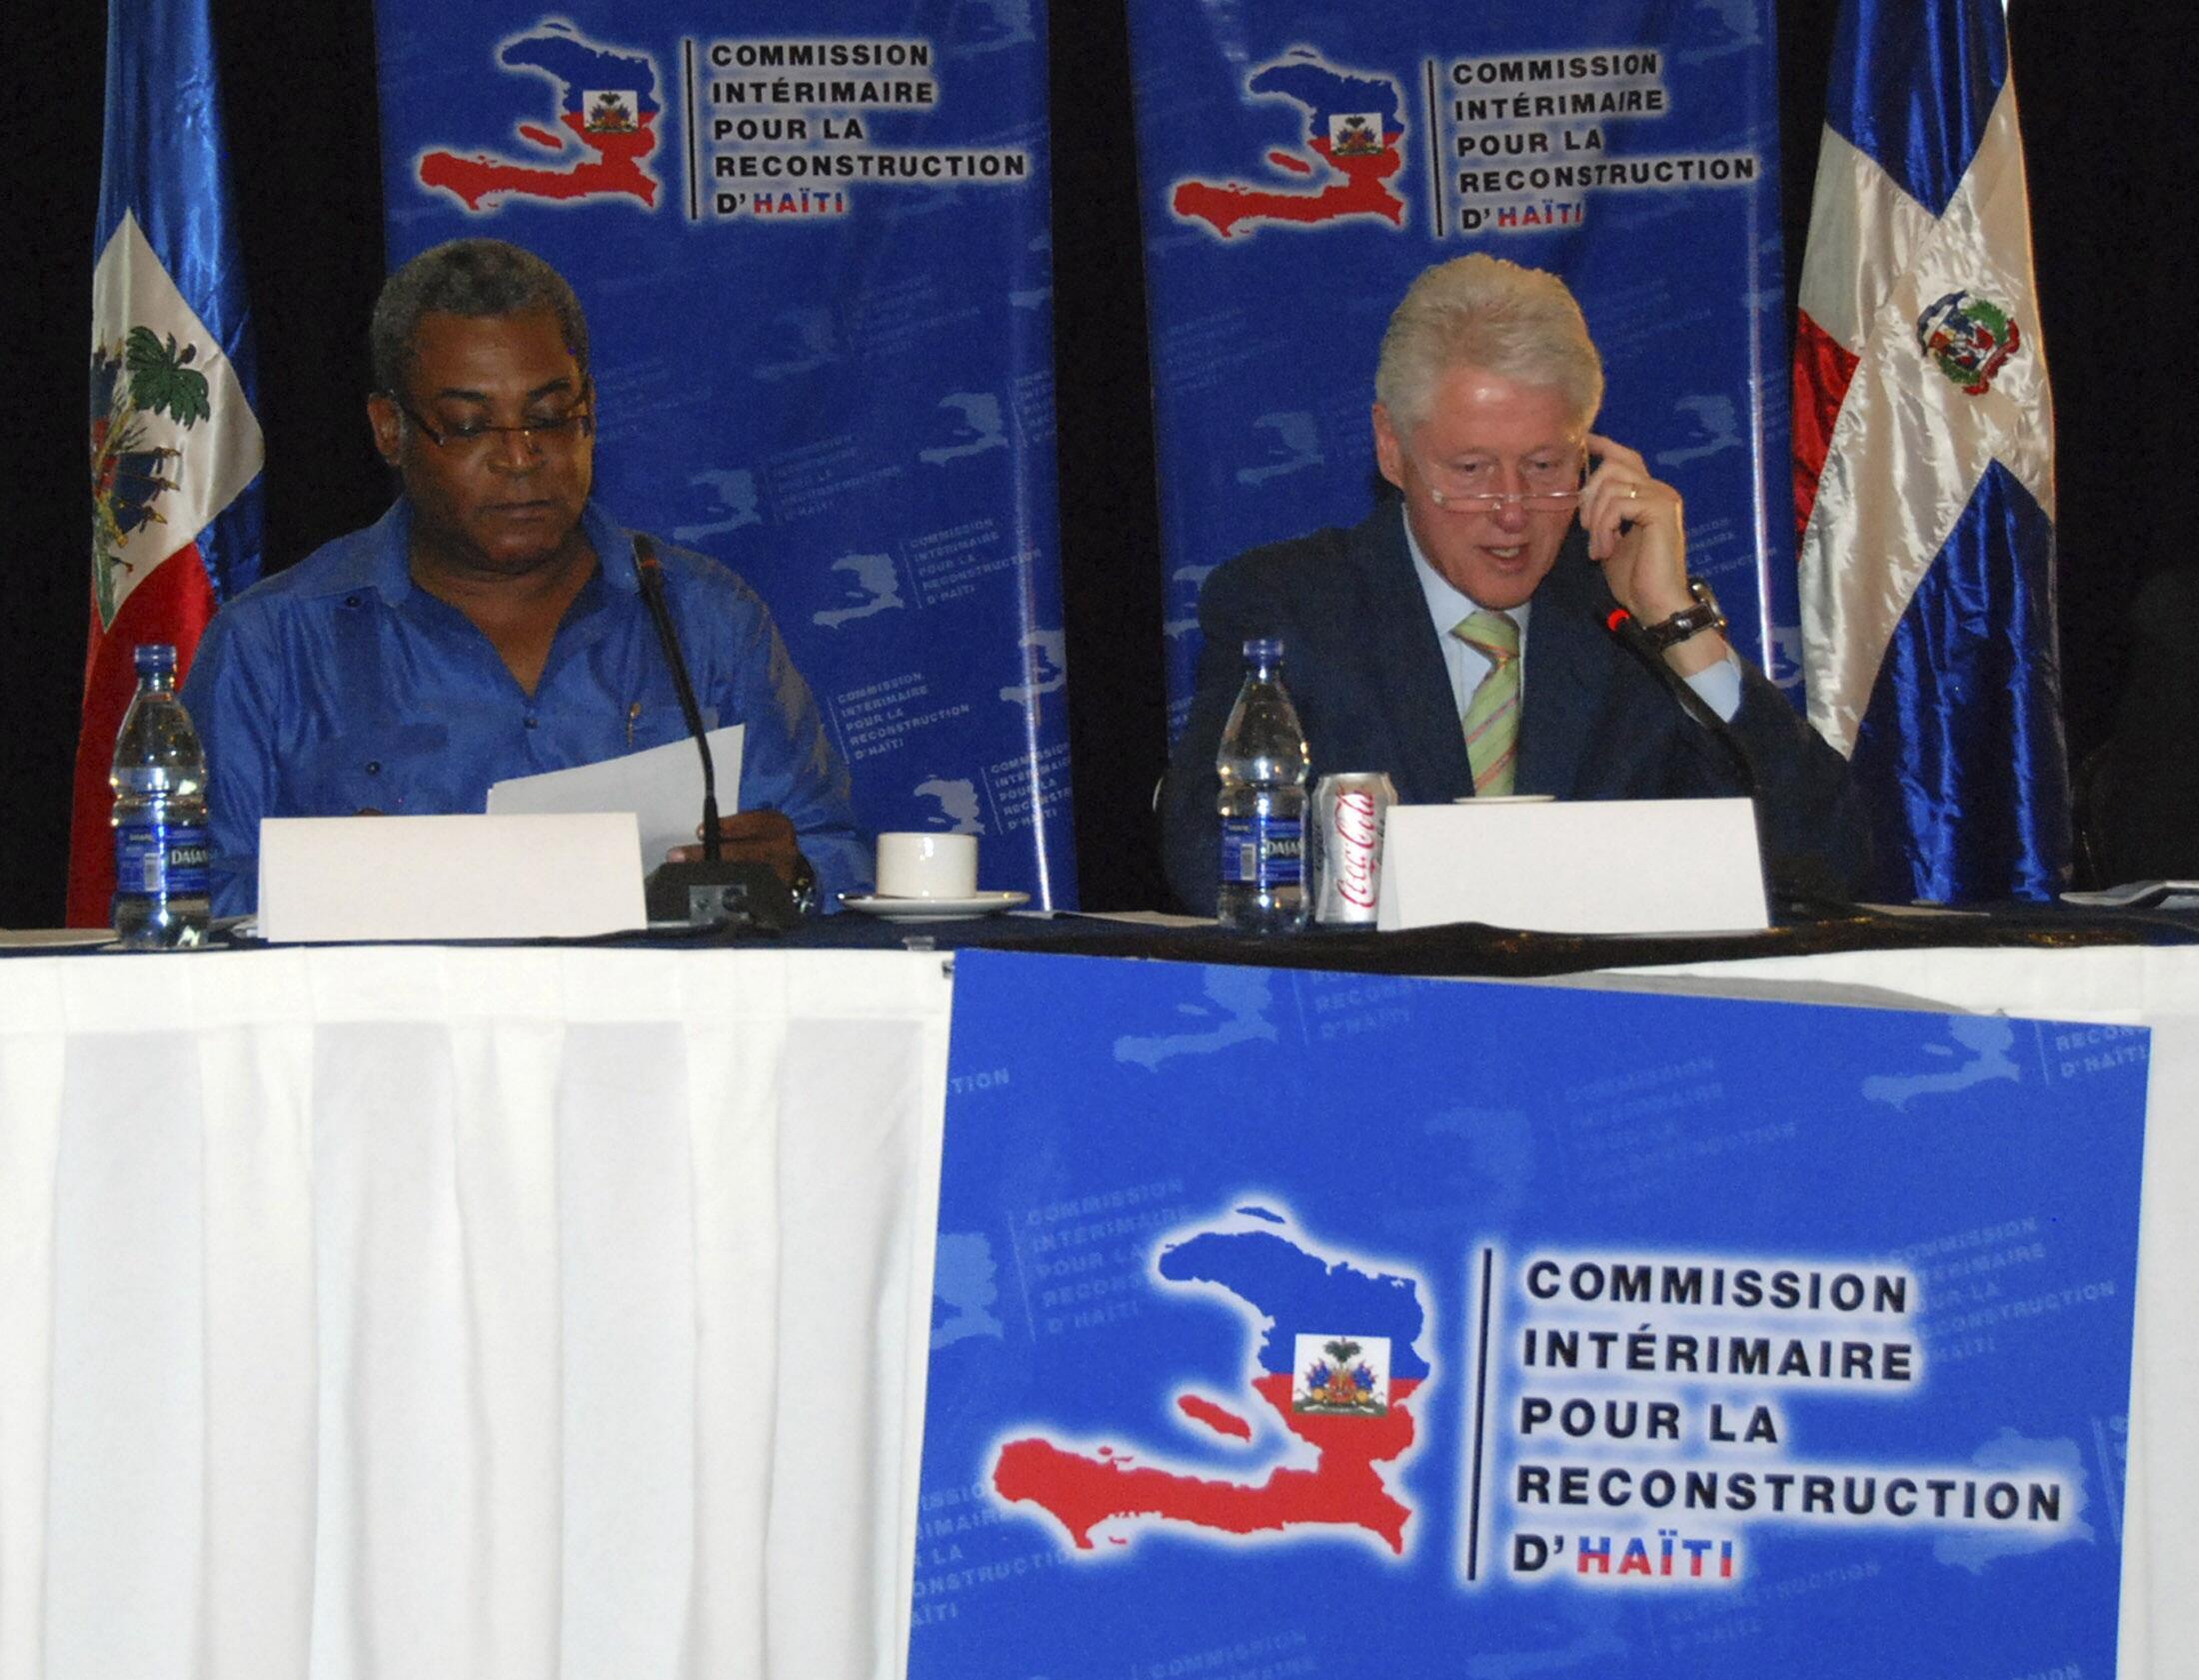 O primeiro-ministro haitiano, Jean-Max Bellerive et le ex-president Bill Clinton durante encontro em Punta Cana no Haiti.